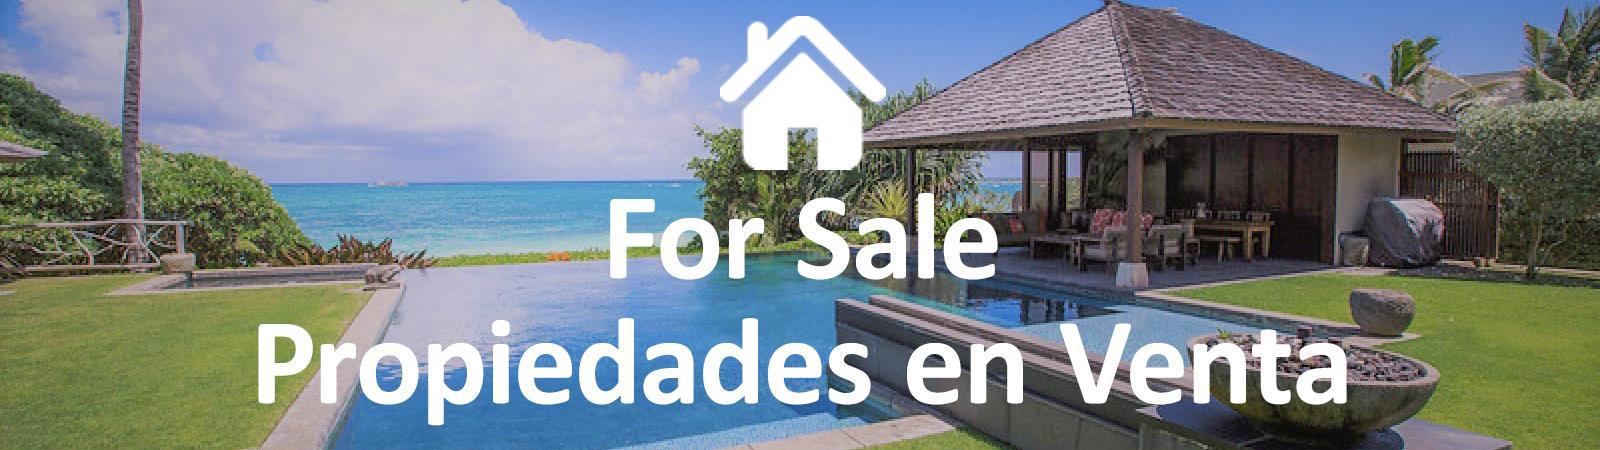 ServiBrokers Properties For Sale Propiedades en Venta